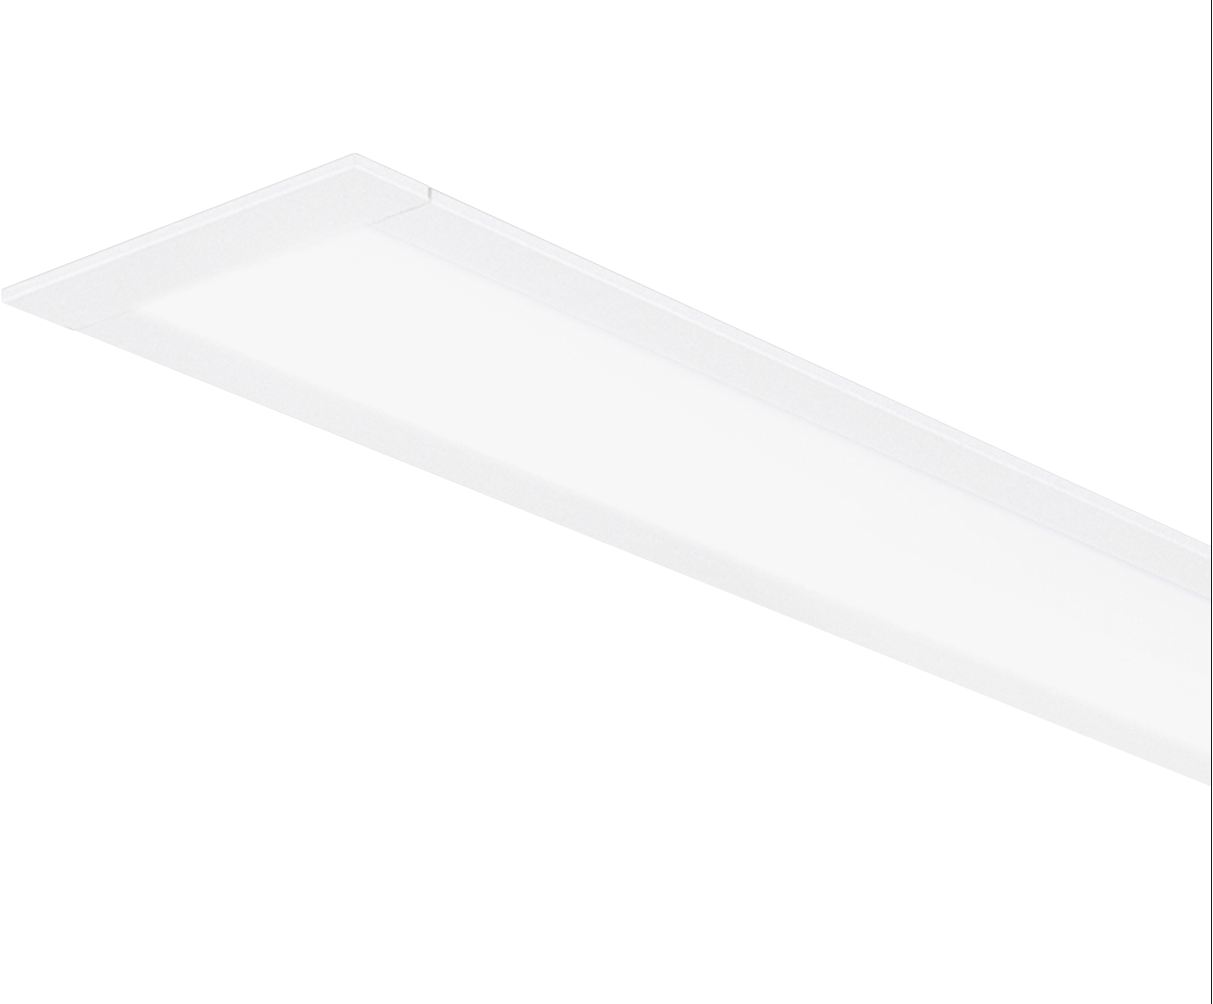 Fifty Light Life Arkoslight Pin Leds In Parallel On Pinterest It